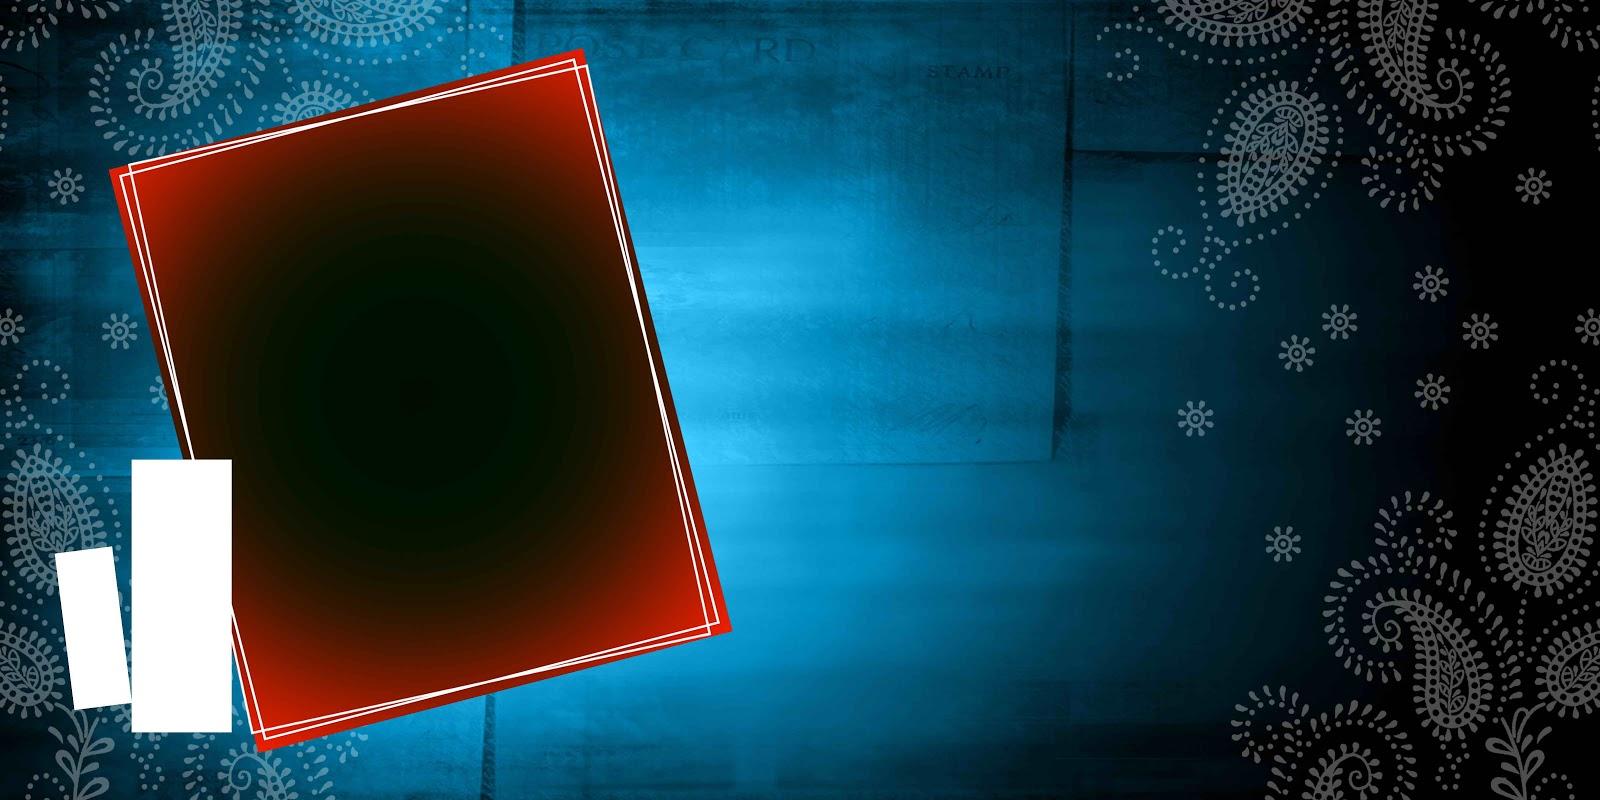 Adobe photoshop background designs free download 8 » background.